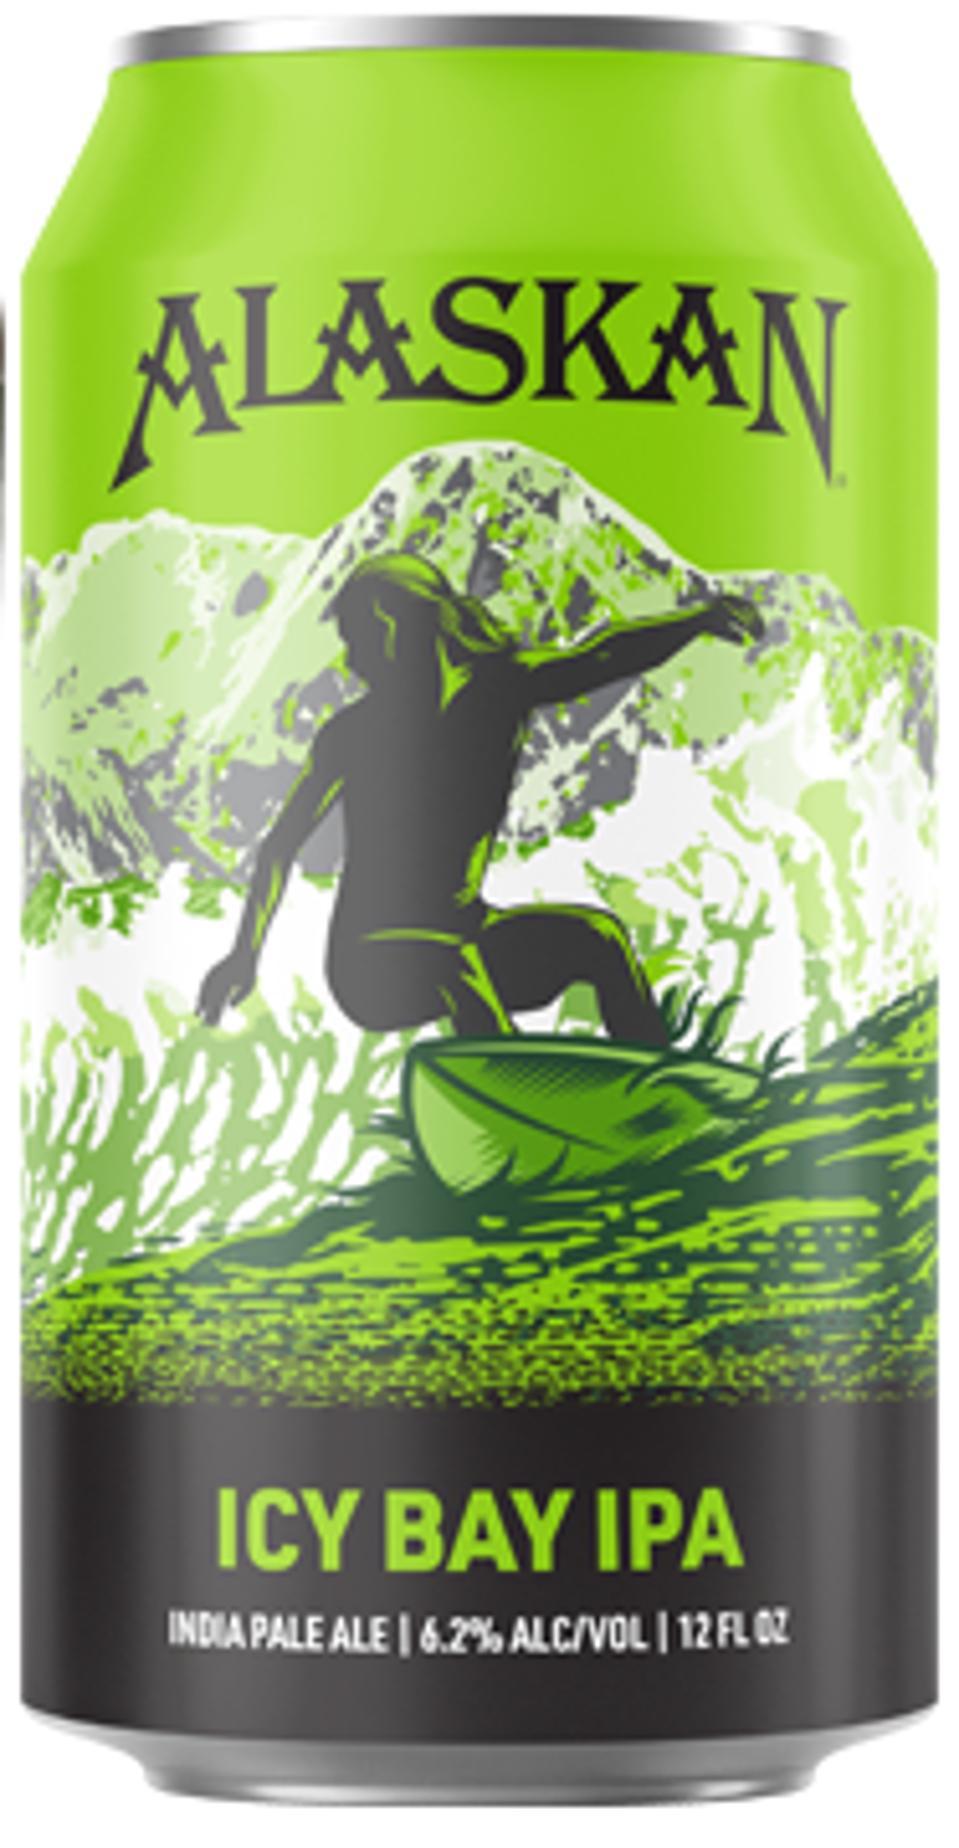 Icy Bay IPA from Alaskan Brewing Company.